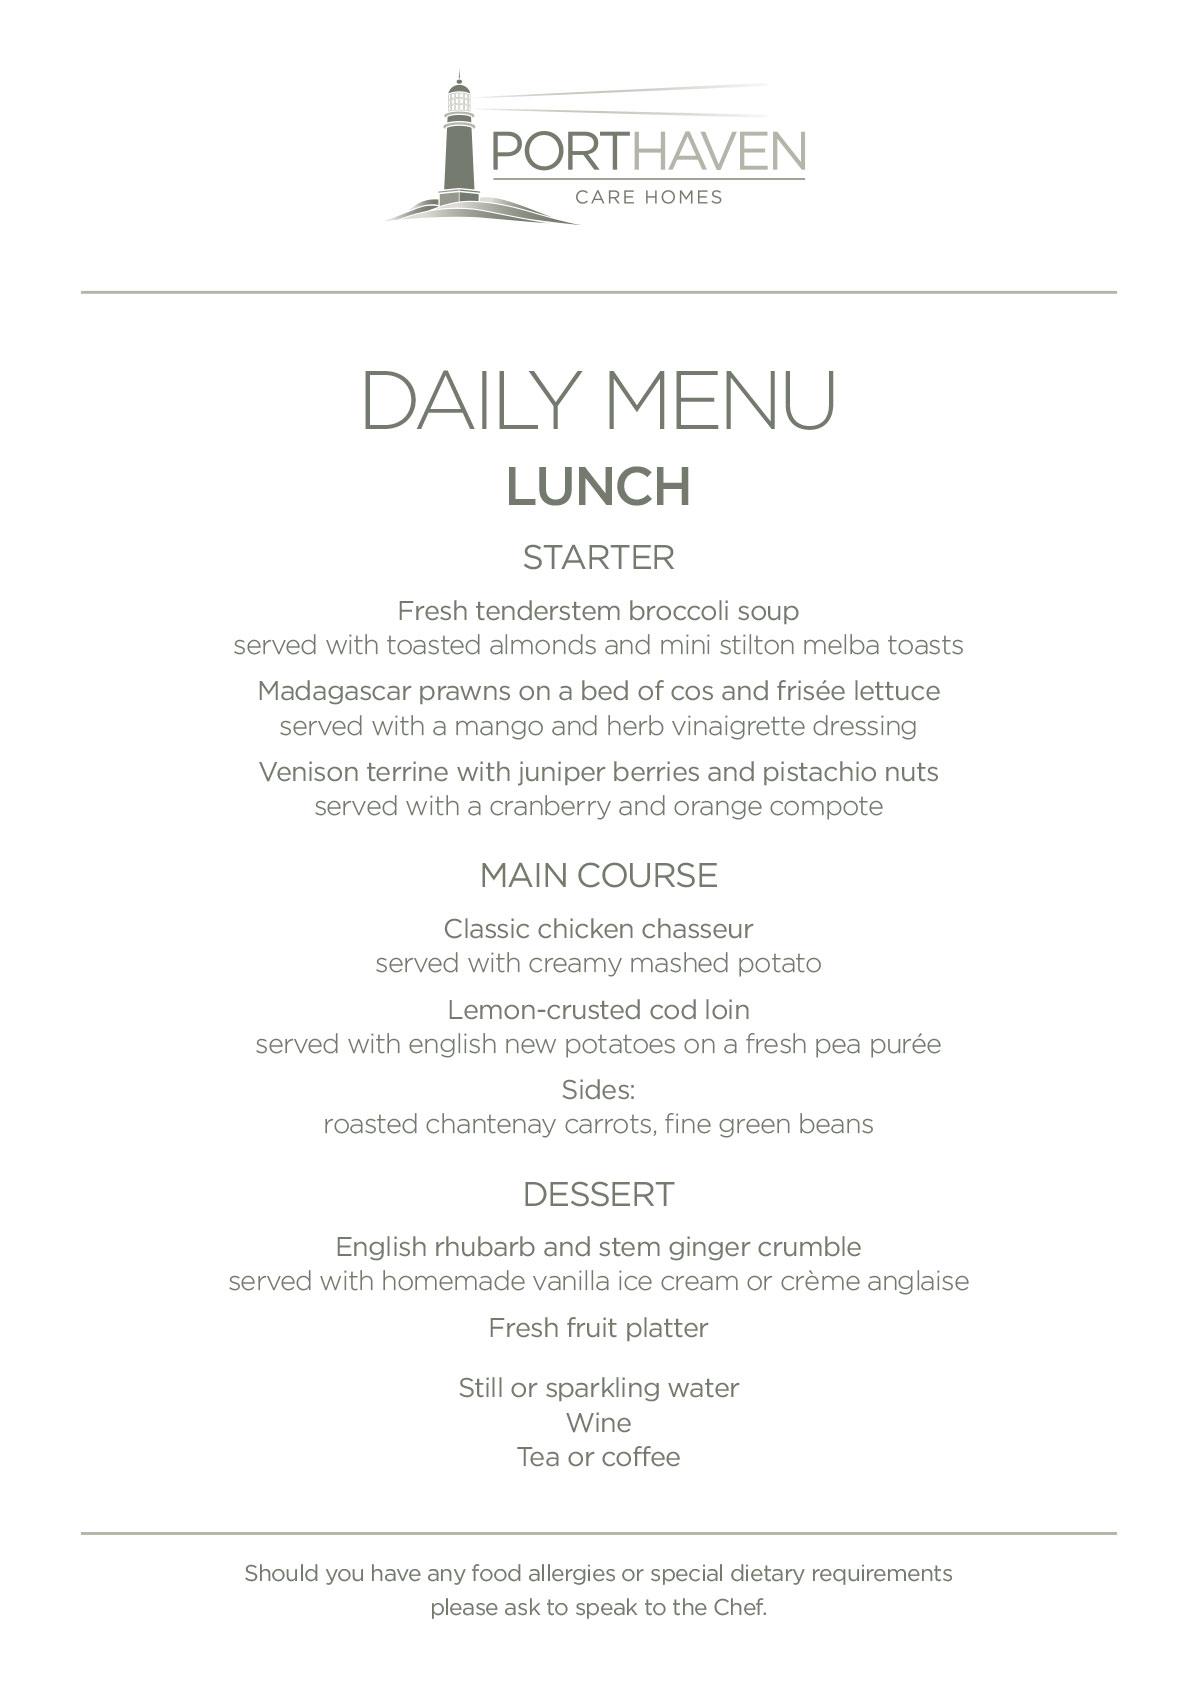 See Restaurant Lunch Menu